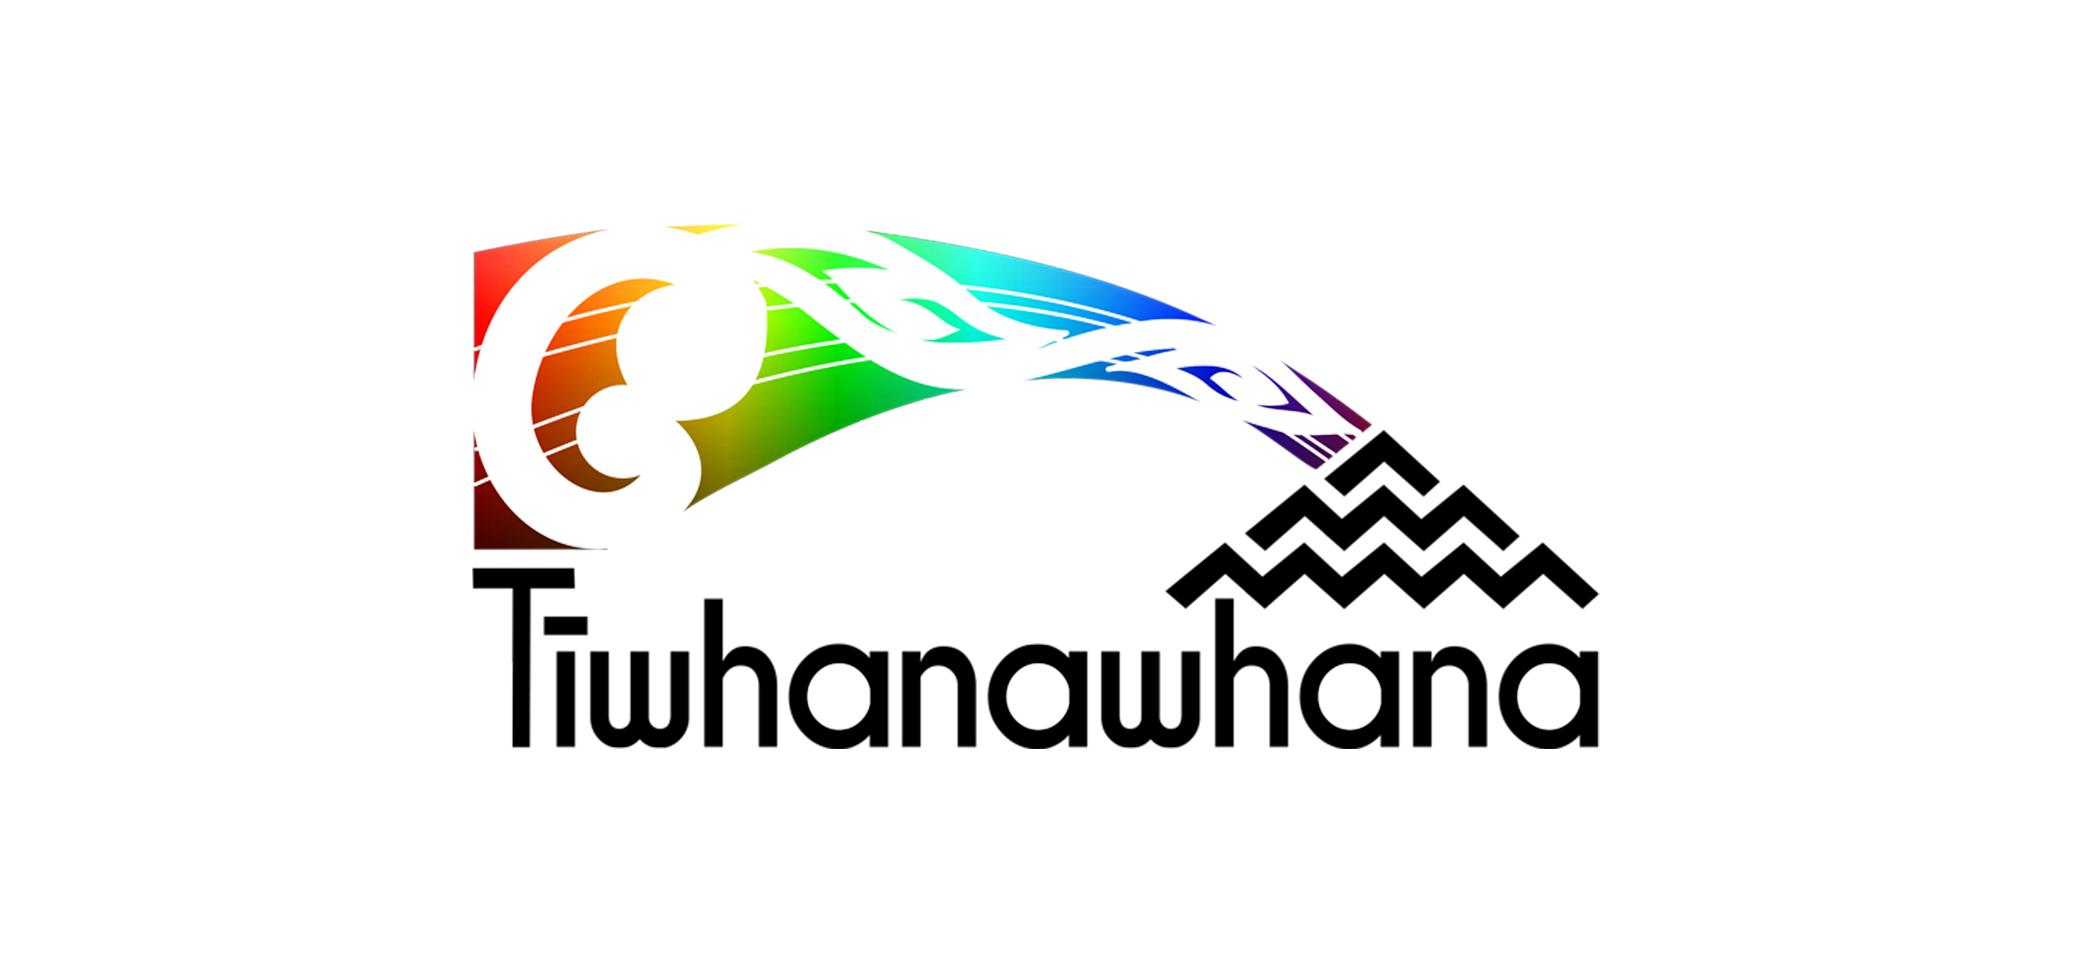 TīwhanawhanaLogoNew.png